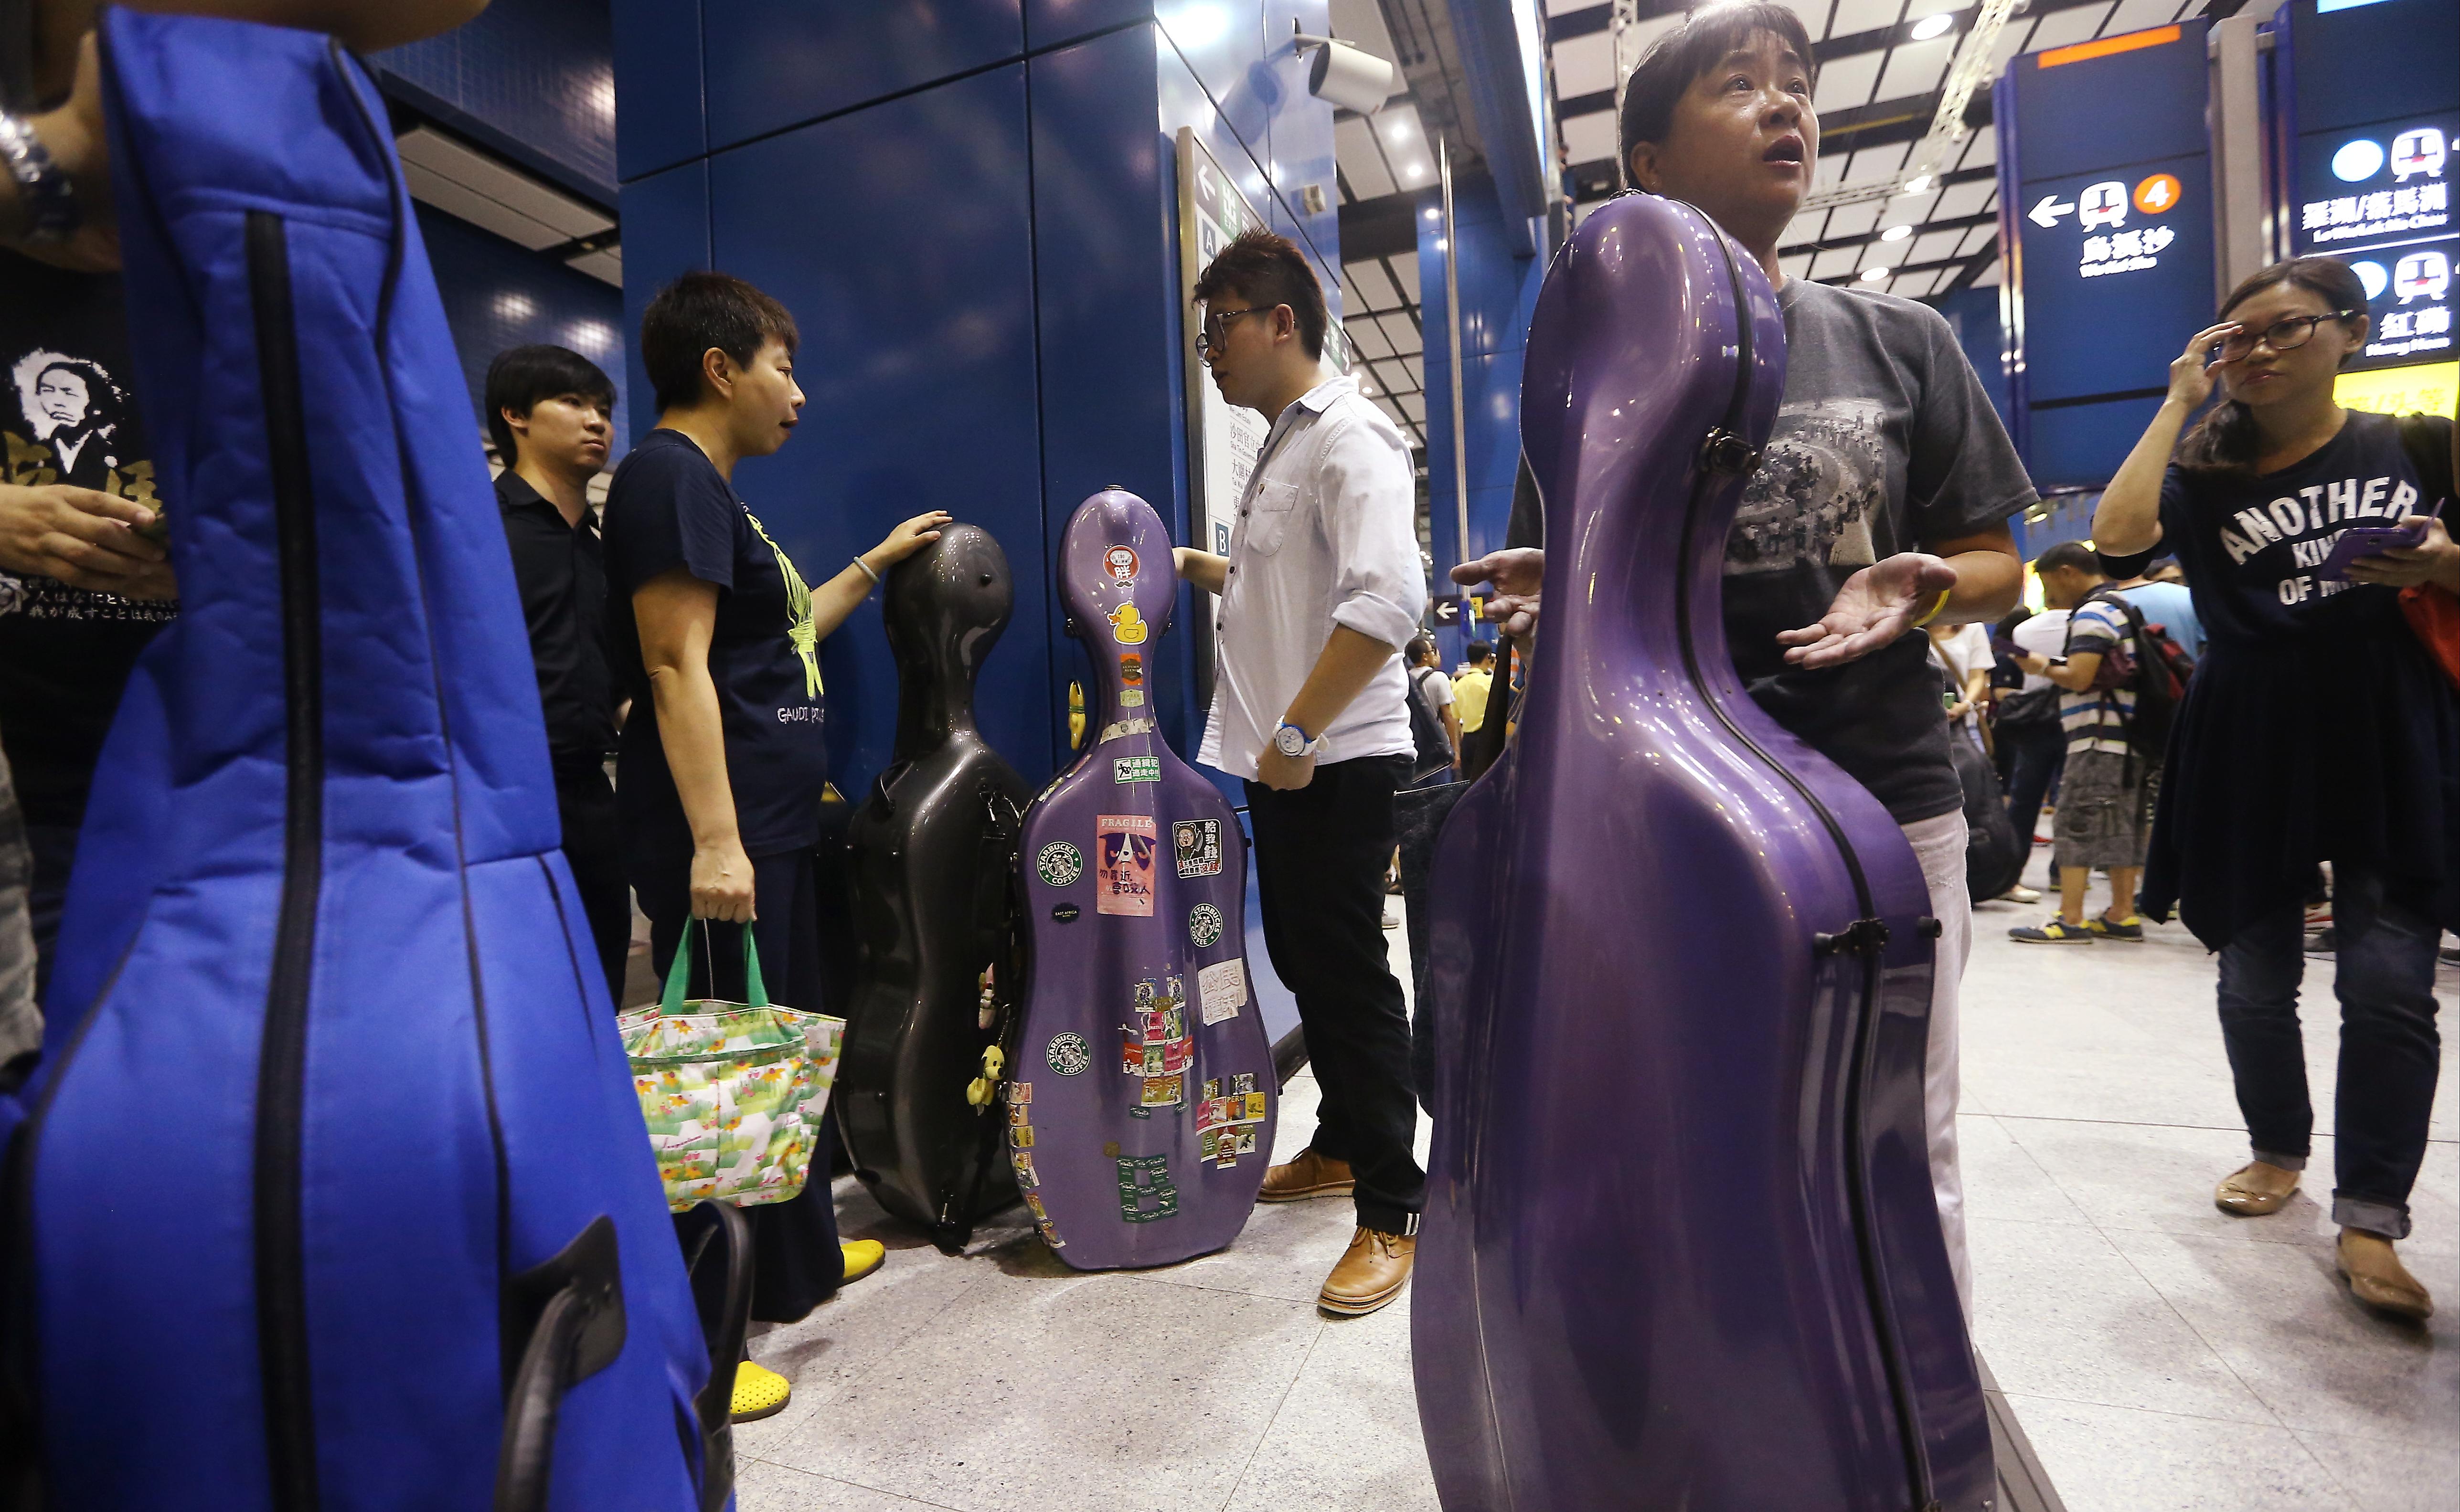 Evening dress hong kong metro